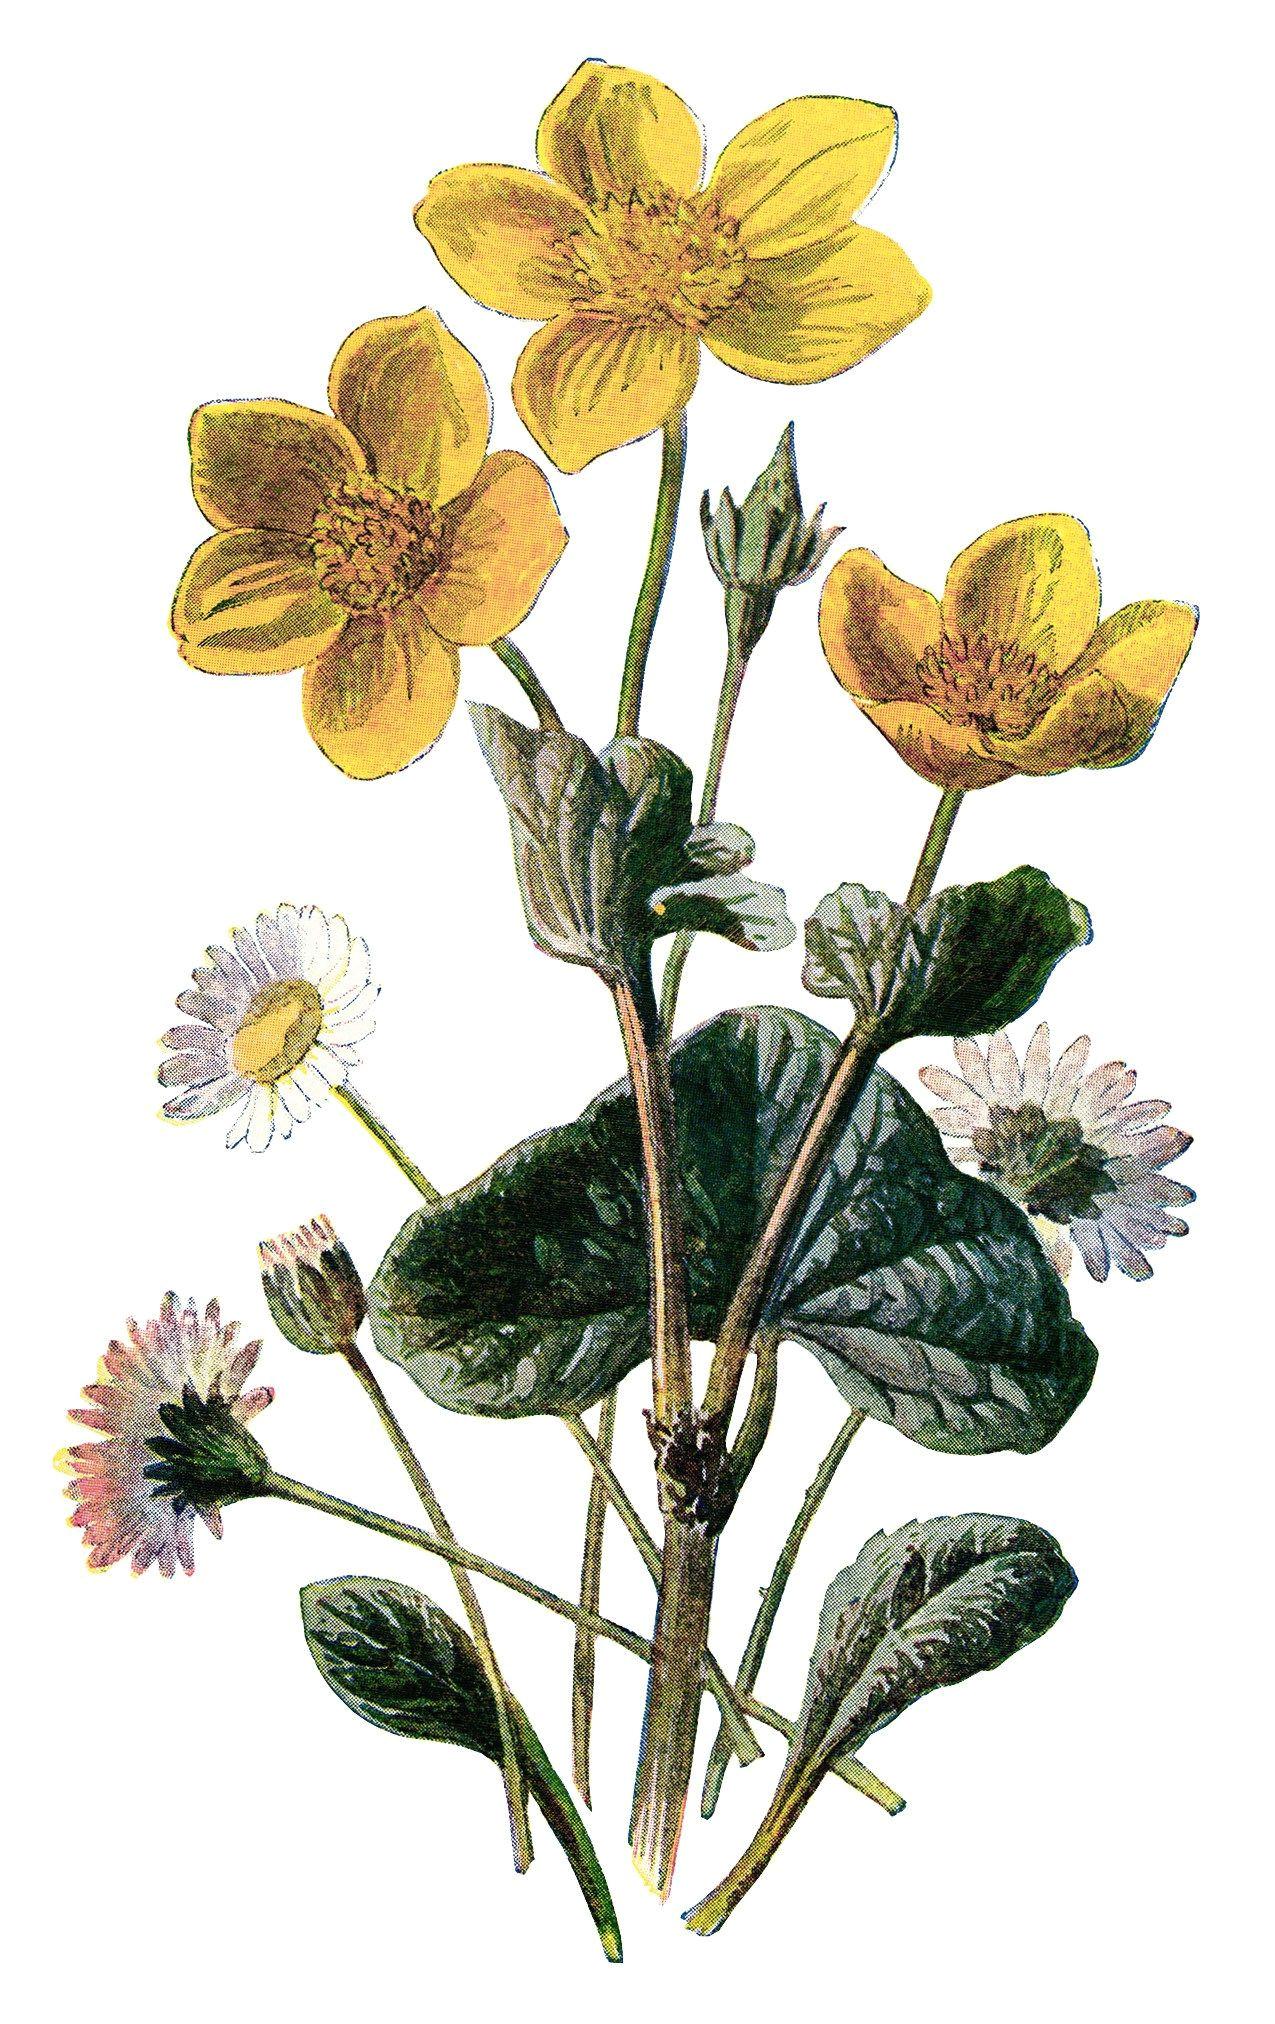 marigold clip art vintage flower illustration yellow flower floral botanical drawing frederick edward hulme